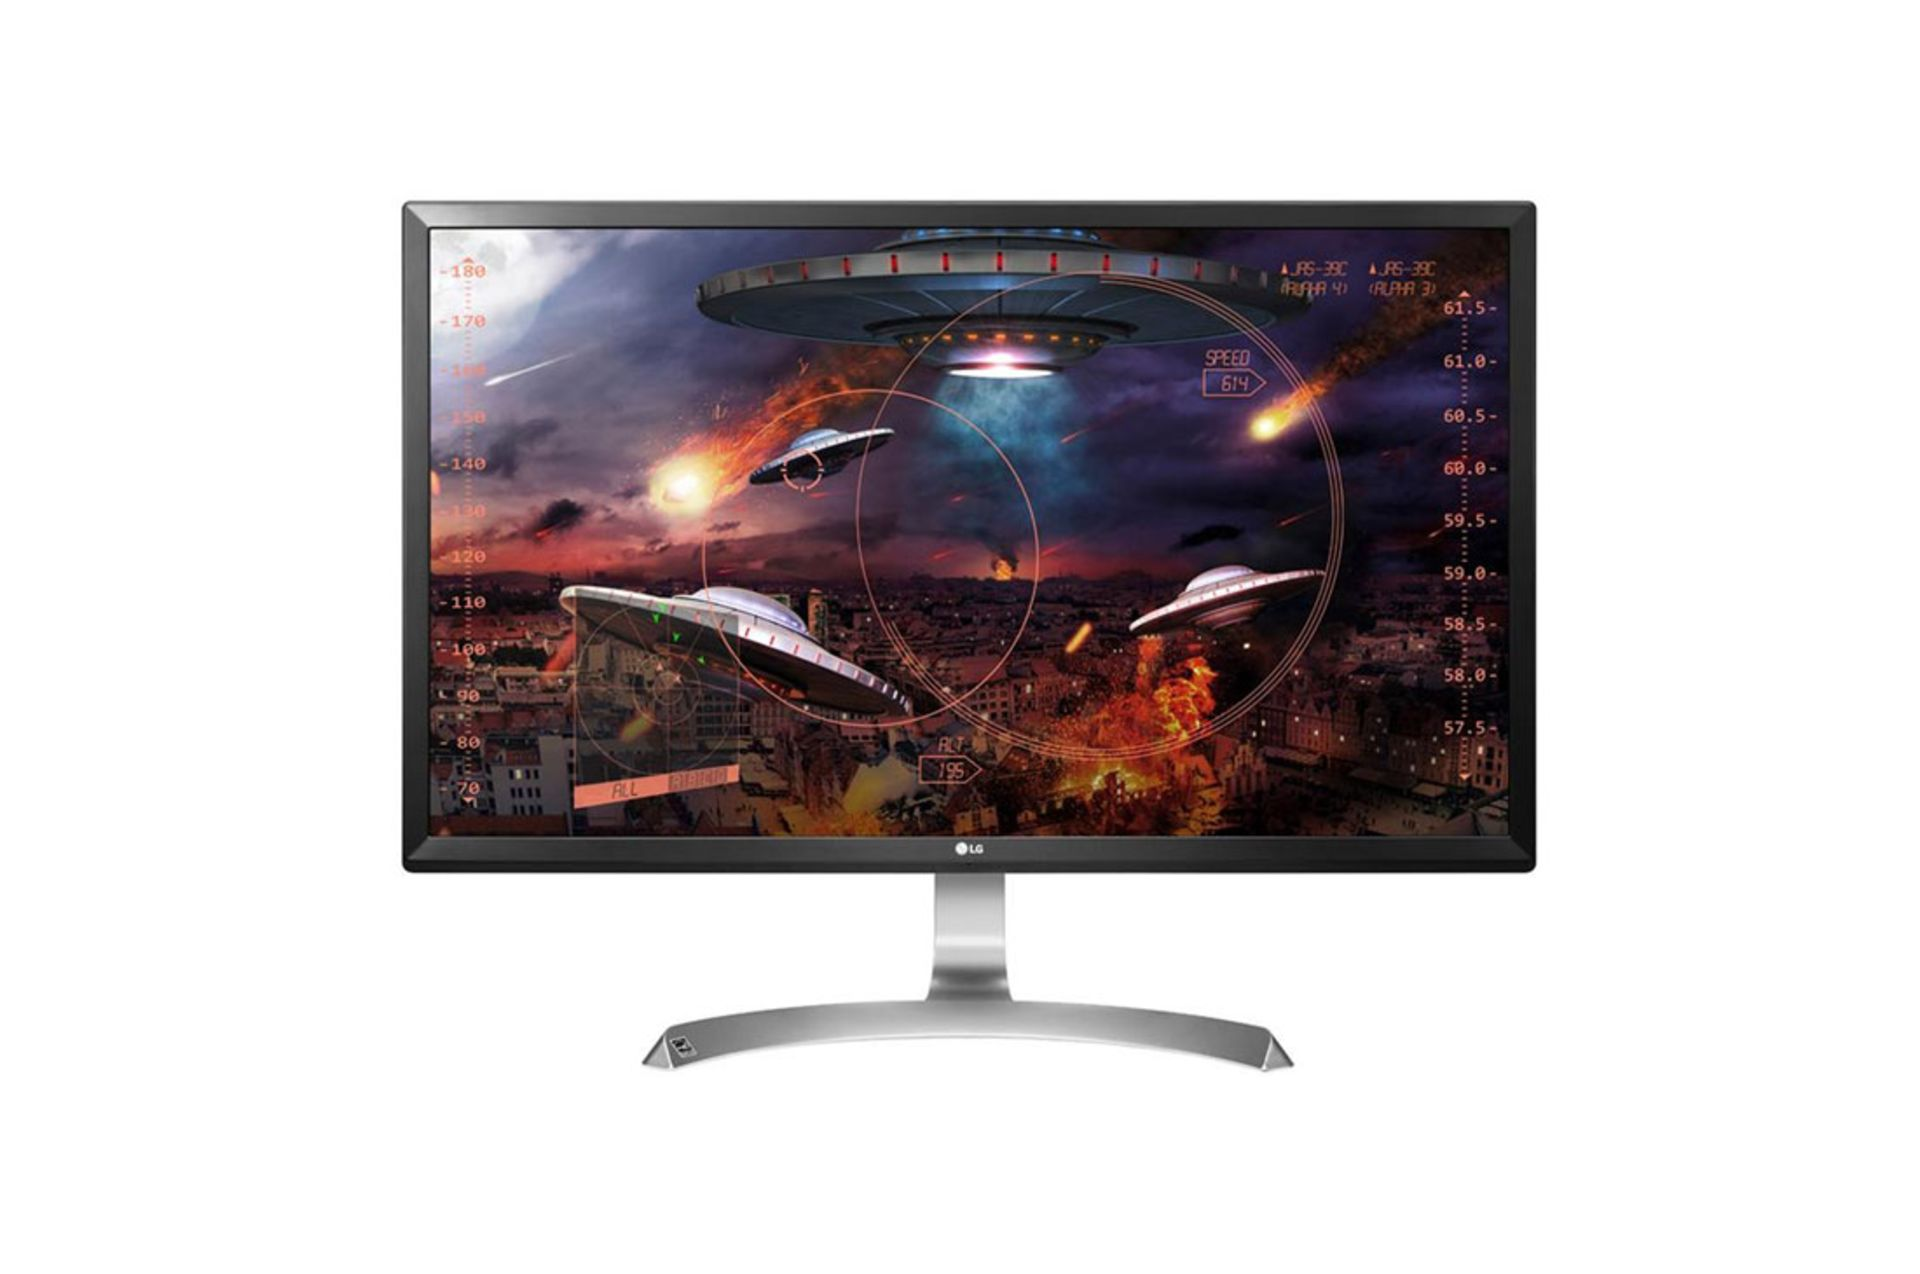 + VAT Grade A LG 27 Inch 4K ULTRA HD IPS LED MONITOR - 3840 X 2160P - HDMI X 2, DISPLAY PORT